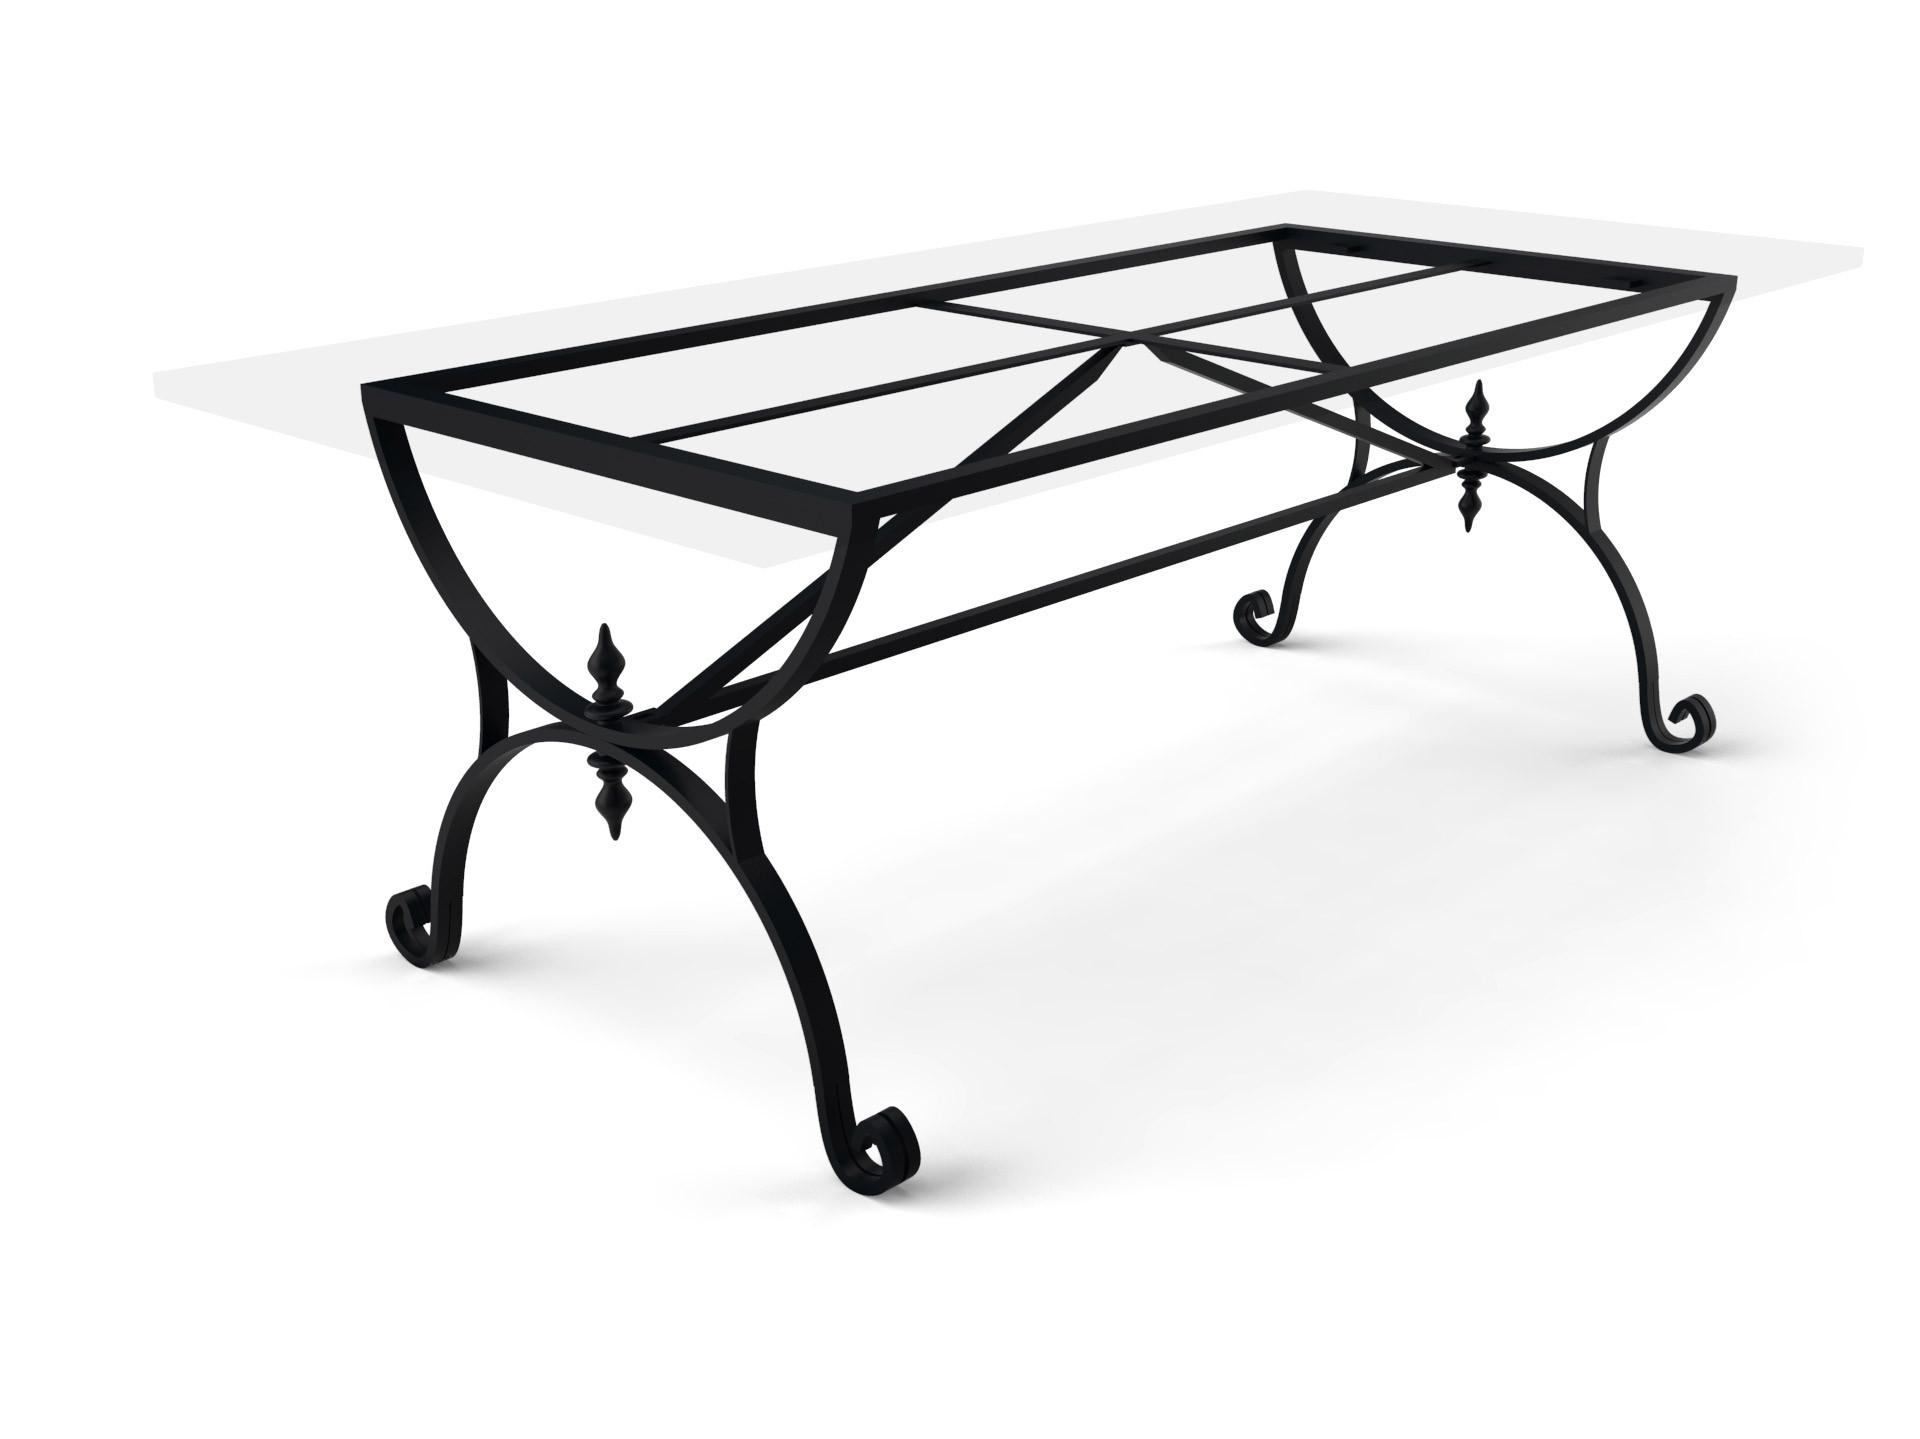 Tischgestell Versailles